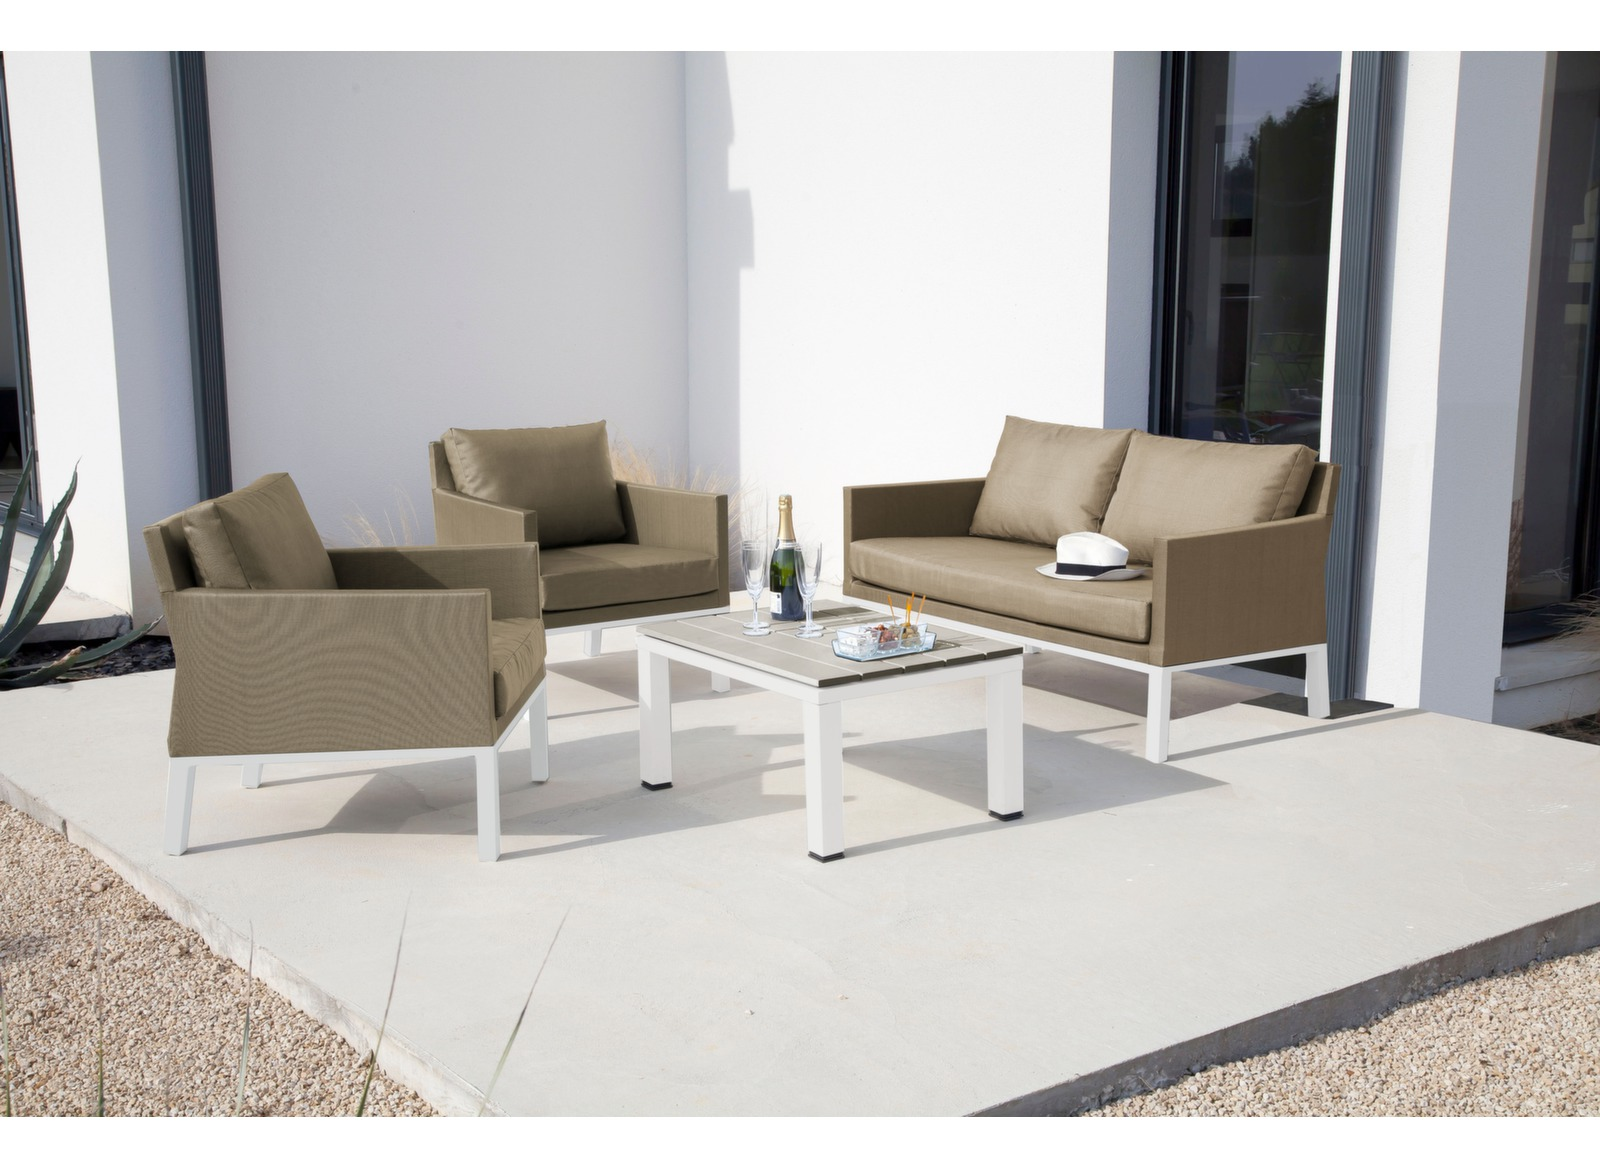 promotion canap de jardin 2 places table basse oslo proloisirs. Black Bedroom Furniture Sets. Home Design Ideas